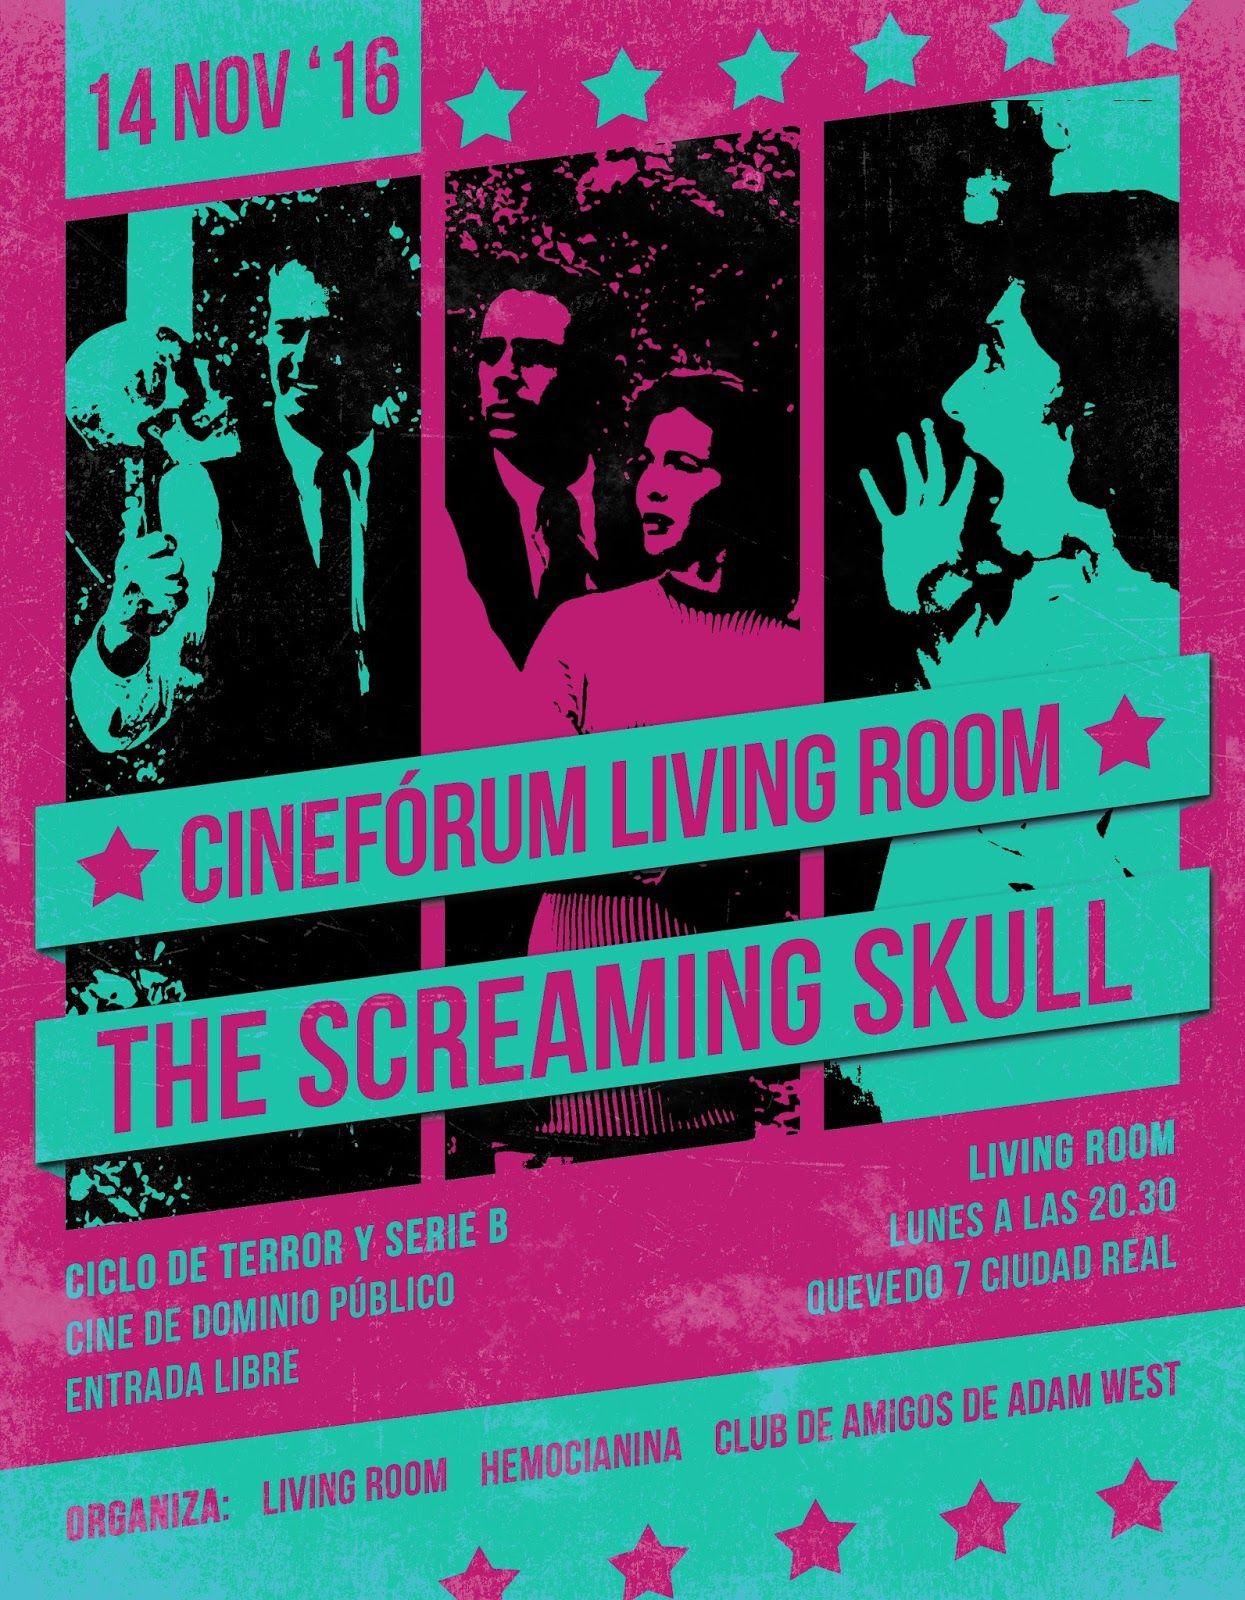 Cinefórum Living Room: The Screaming Skull